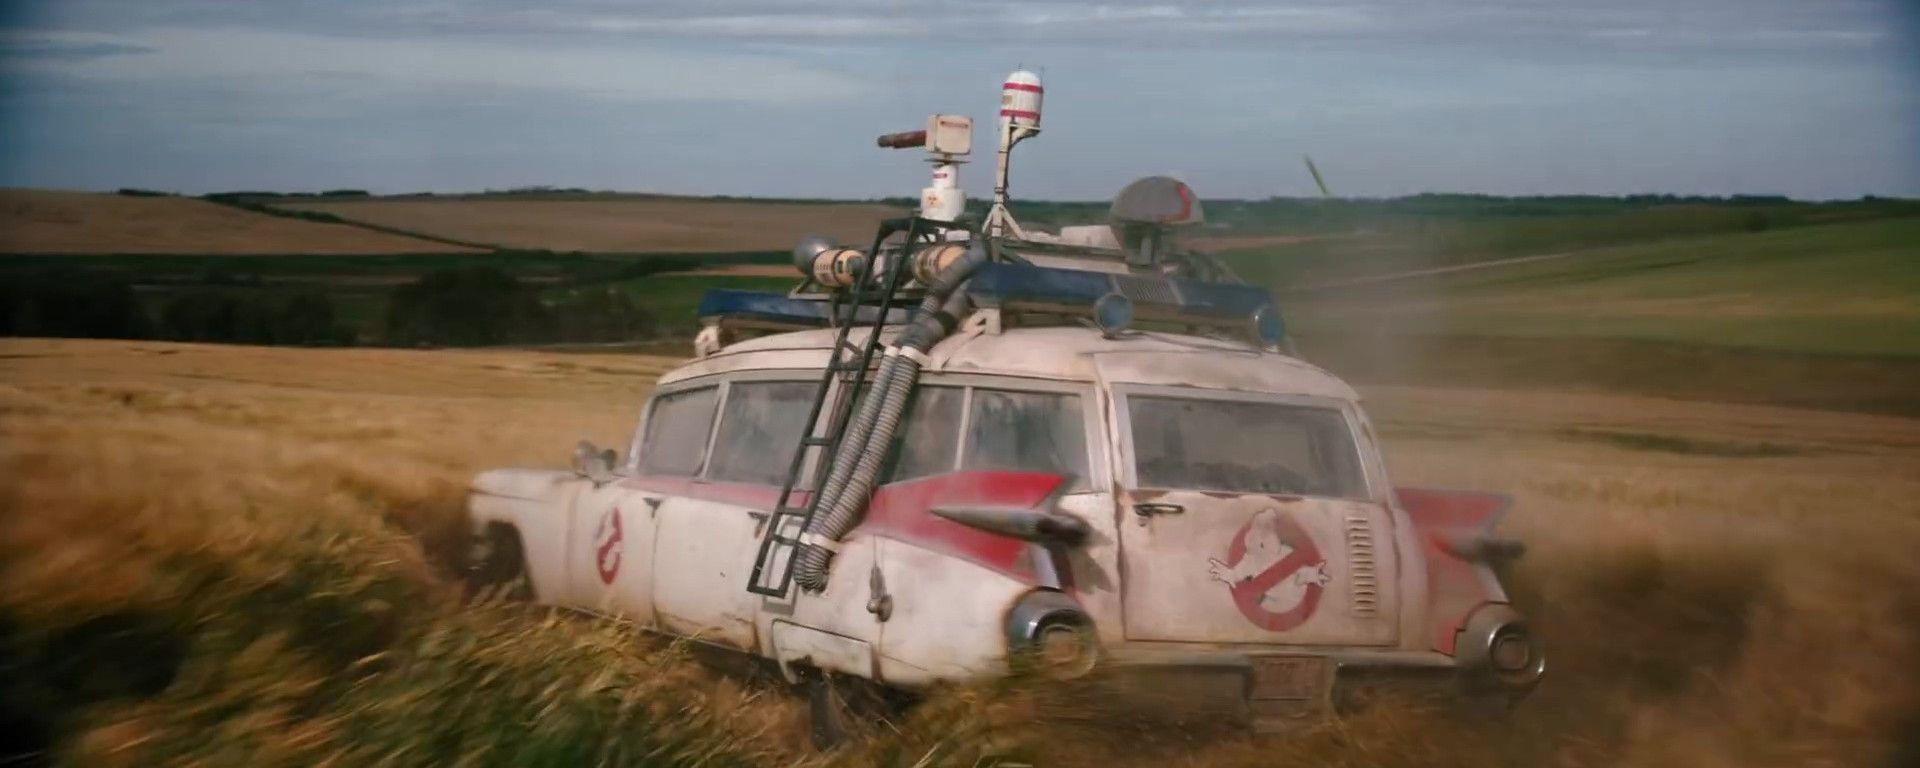 Ghostbusters: Afterlife arriverà il 10 luglio 2020